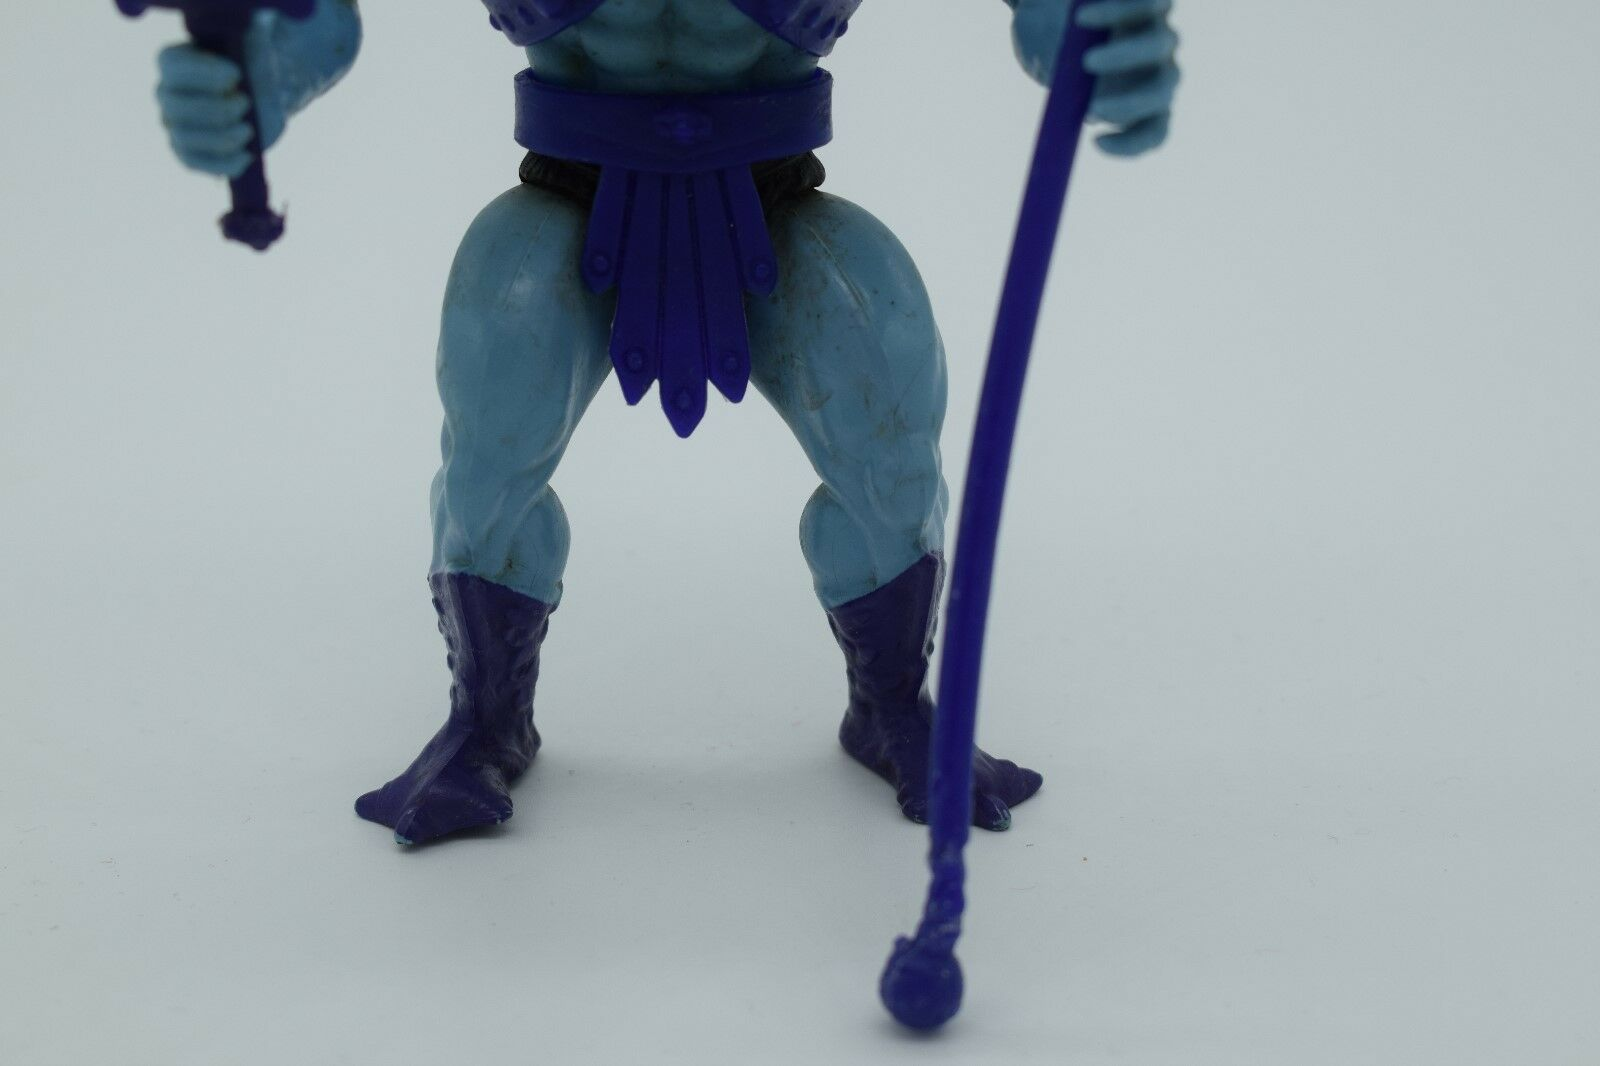 HE-MAN SKELETOR , MOTU, MASTER OF OF OF THE UNIVERSE, 1980S, SKELETOR, 1d6e6a